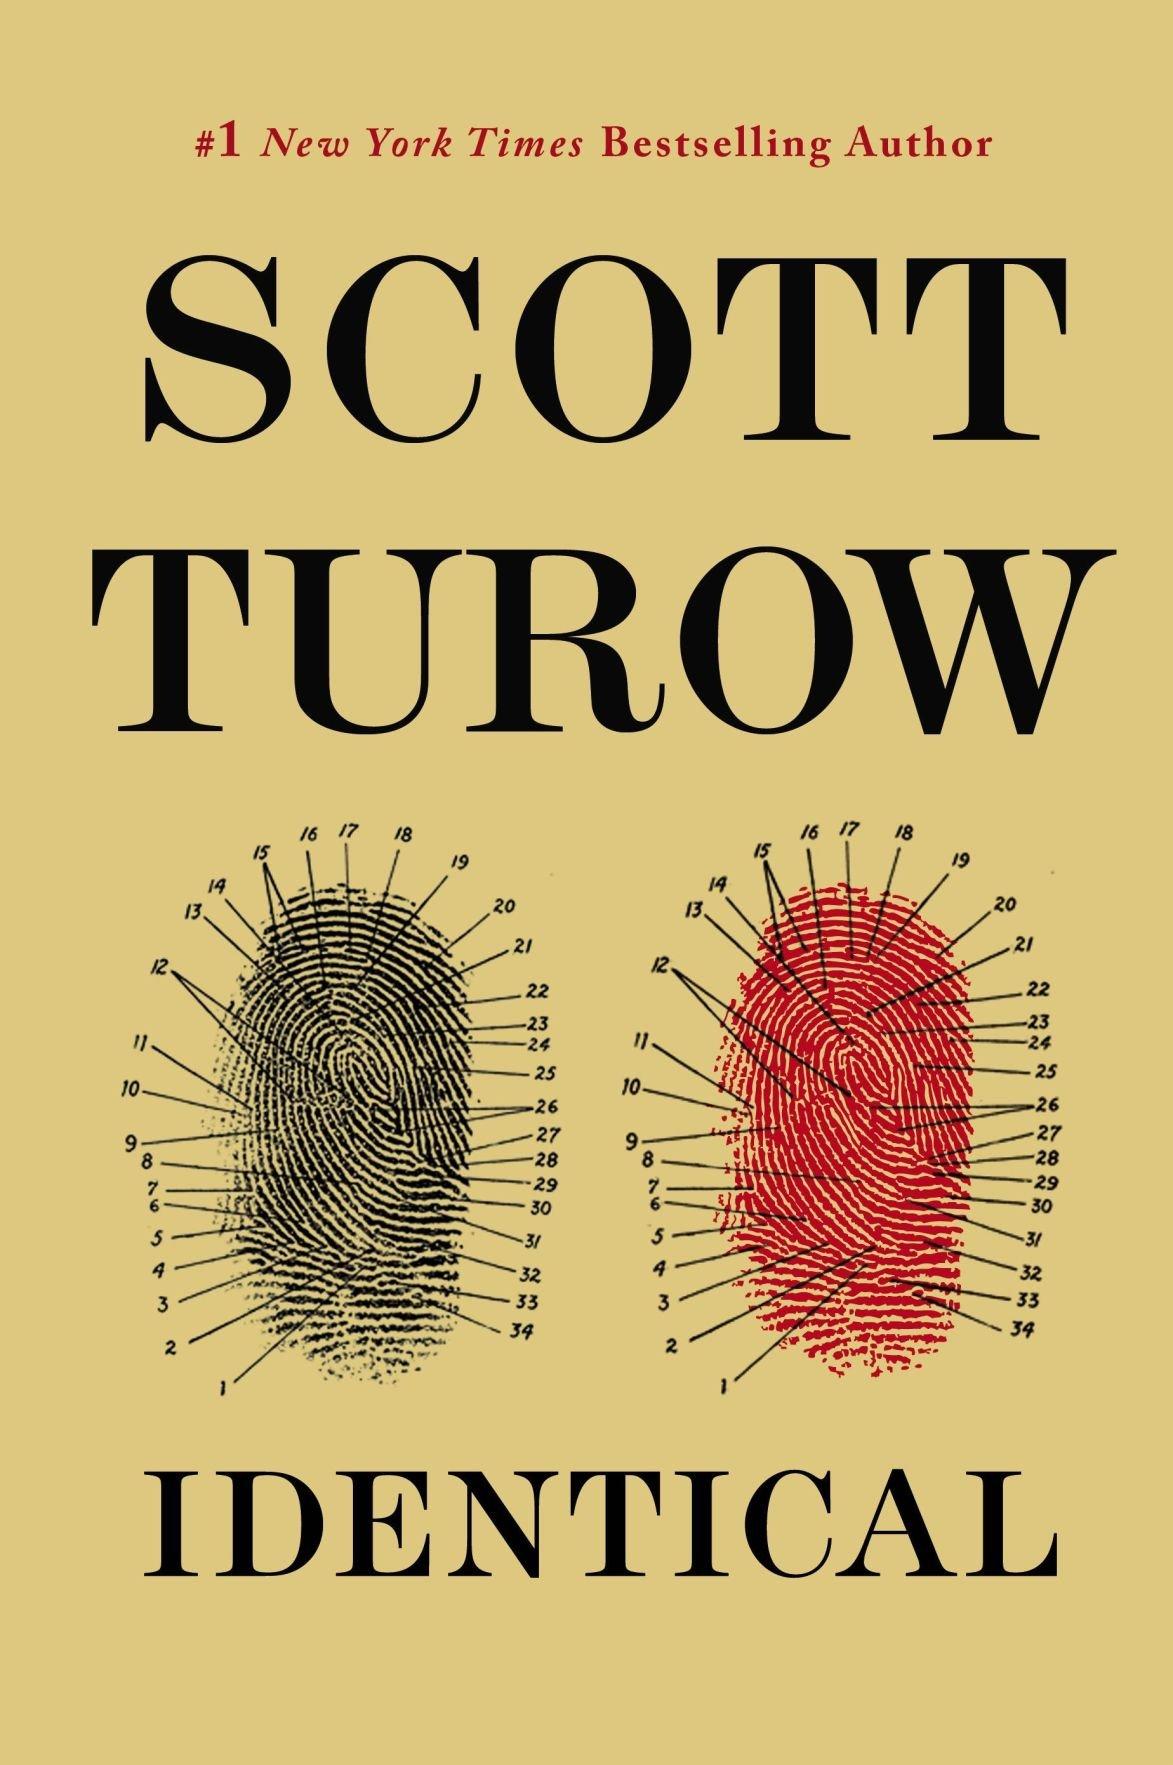 Scott Turow on politics, corruption